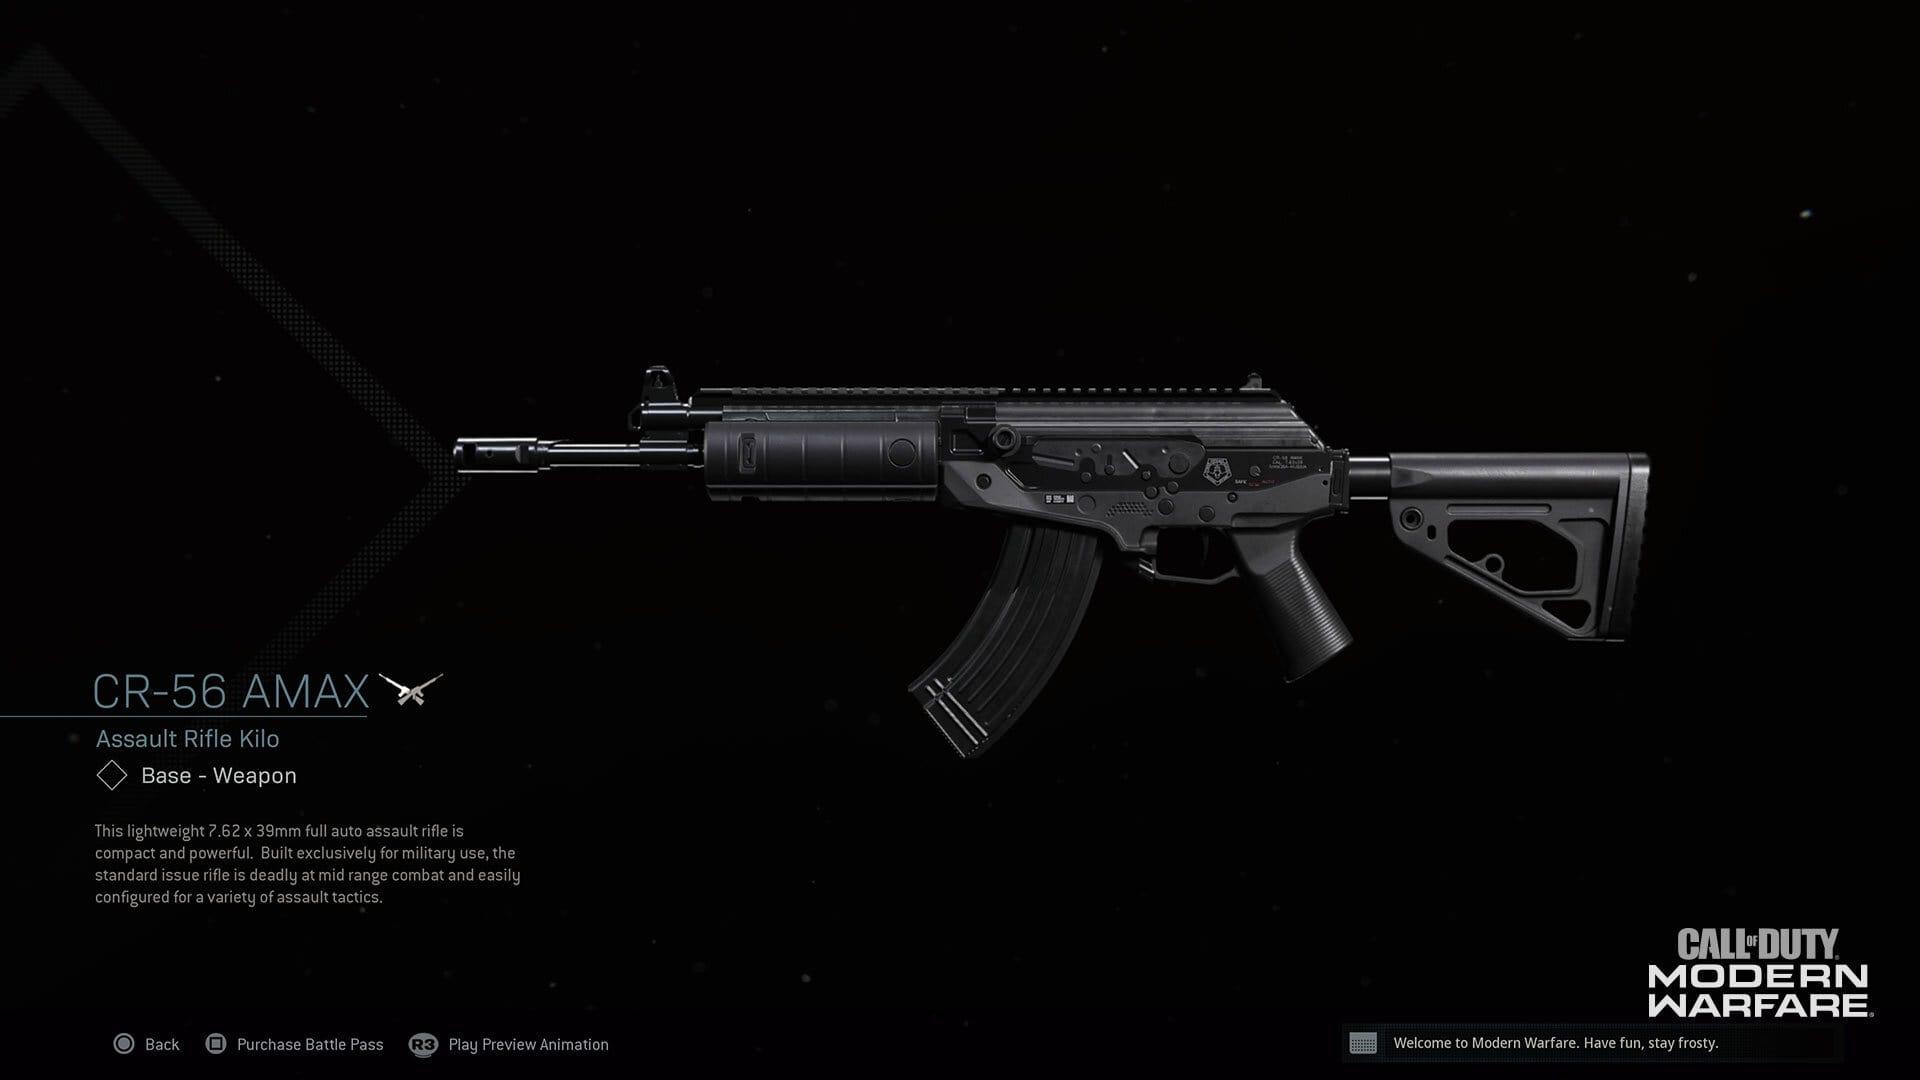 AMAX assault rifle